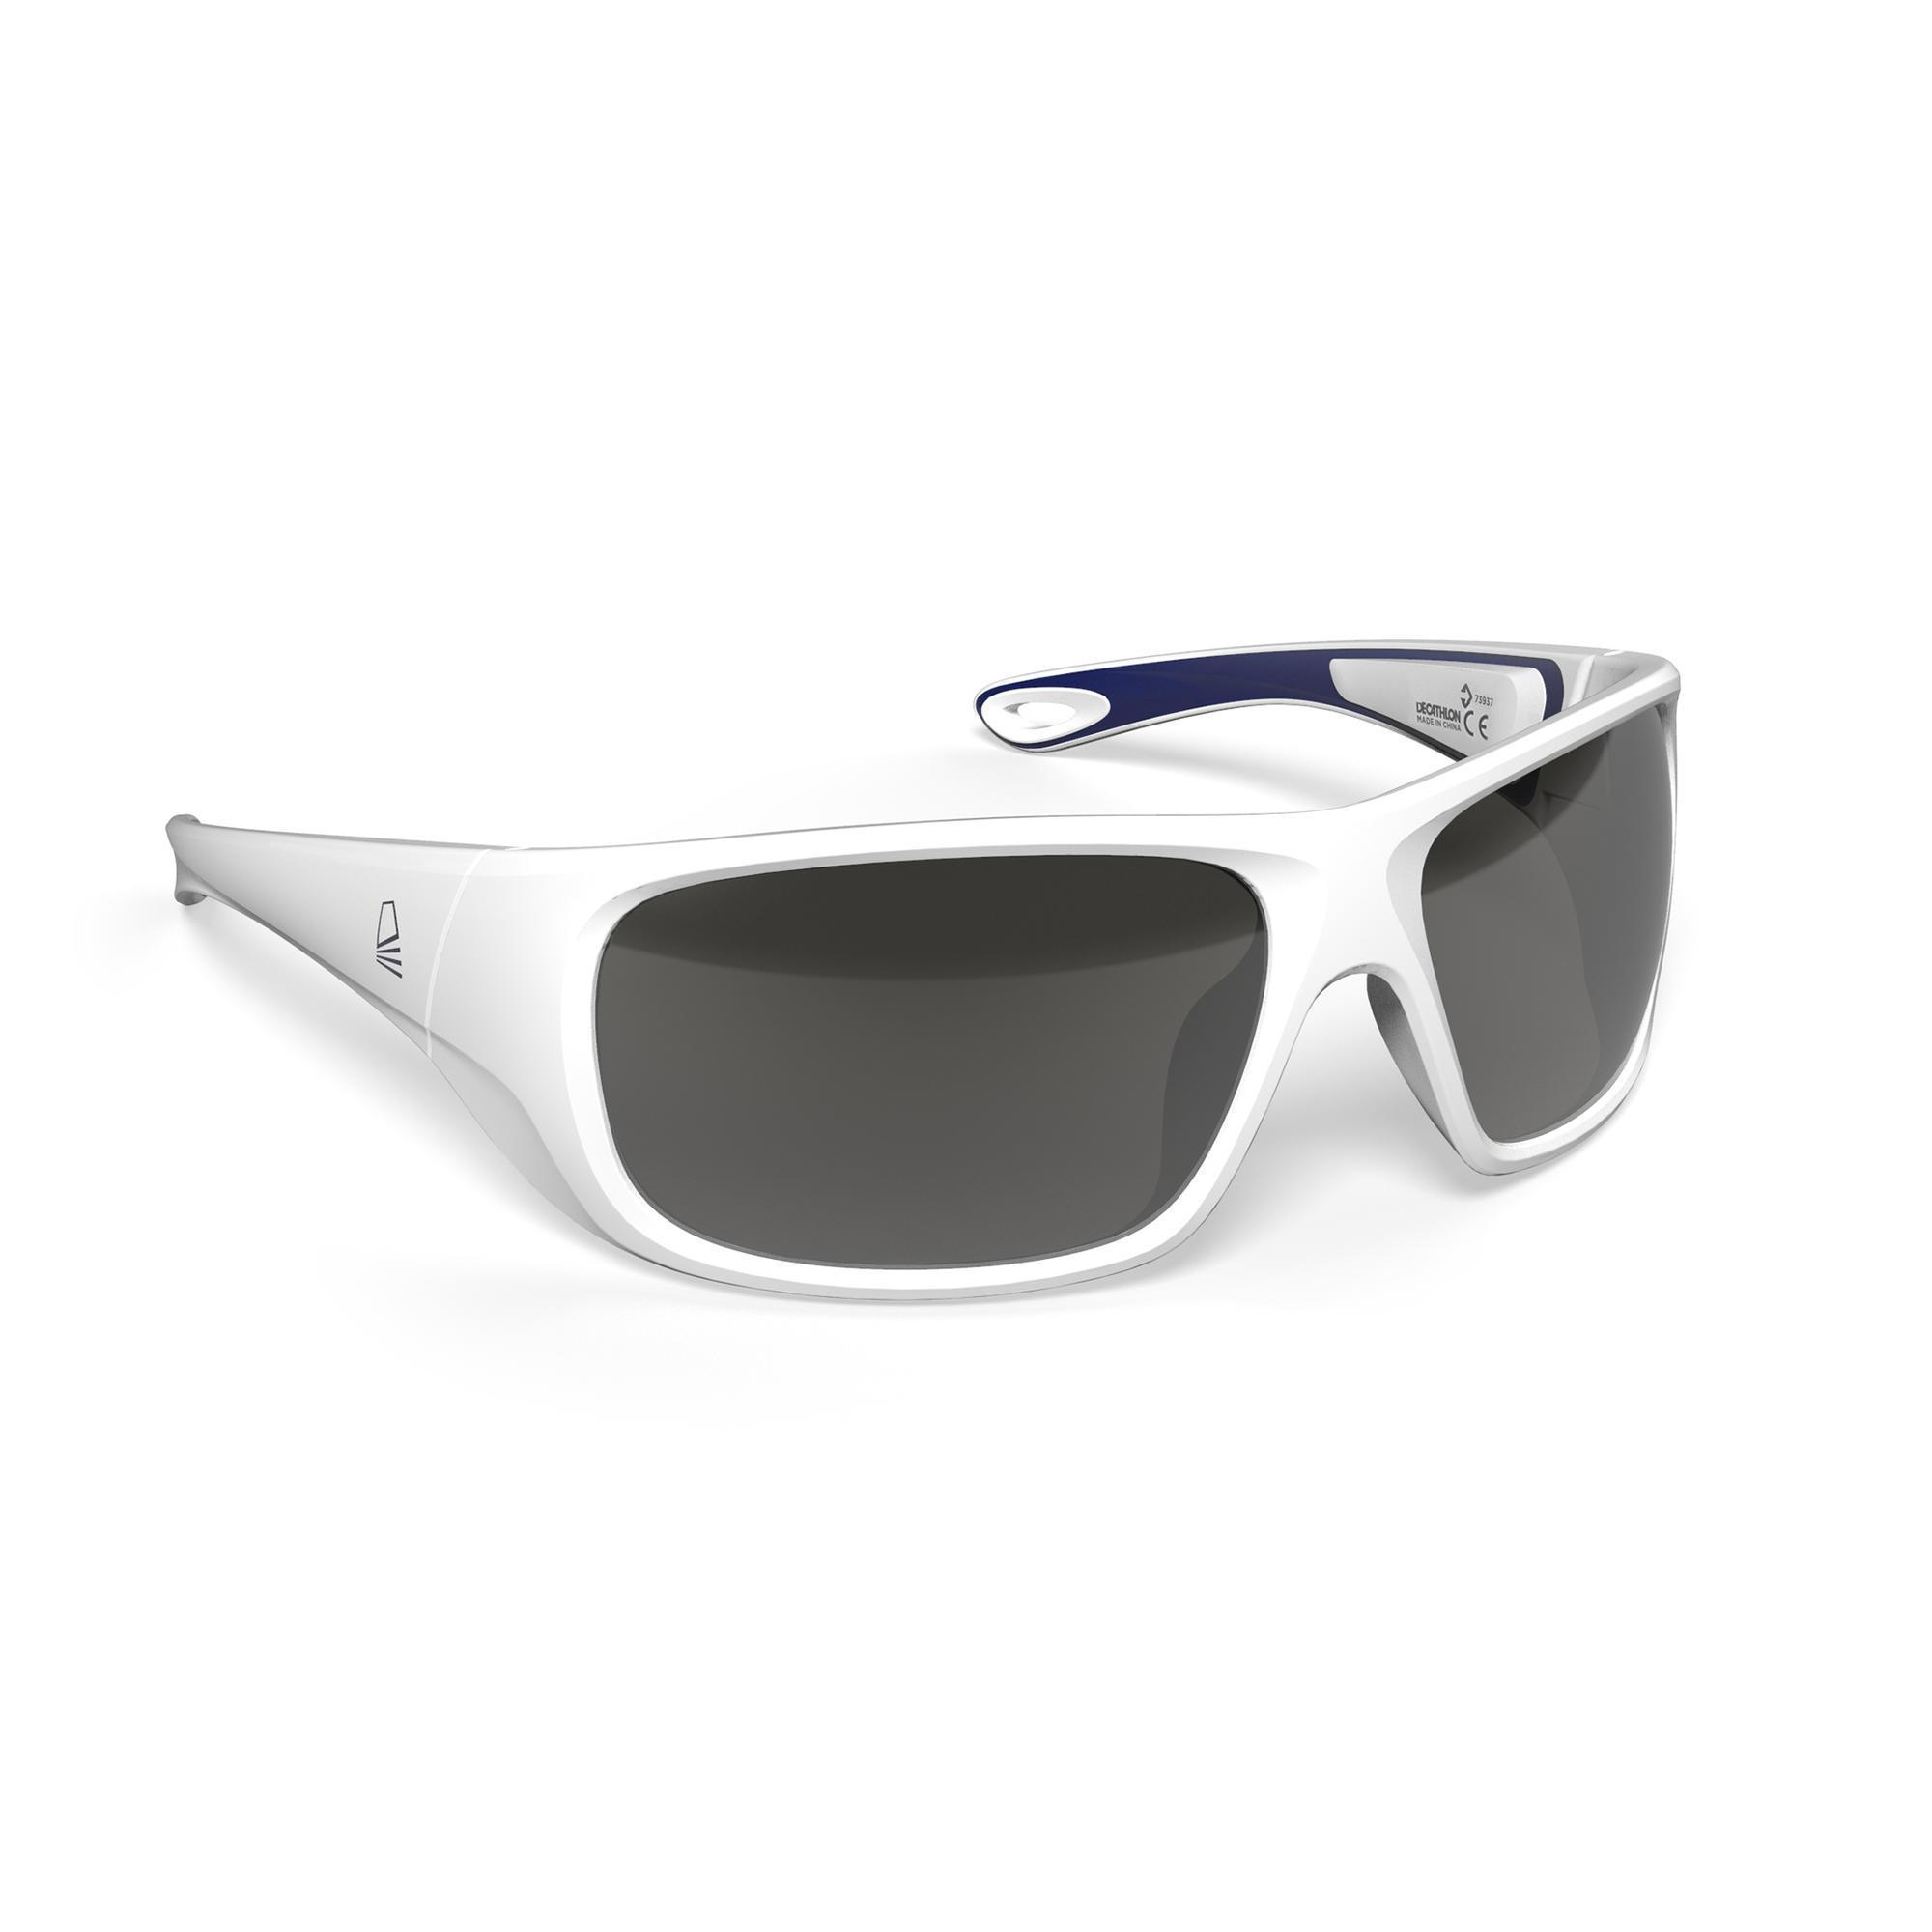 8c97a81bda Comprar Gafas Polarizadas online | Decathlon